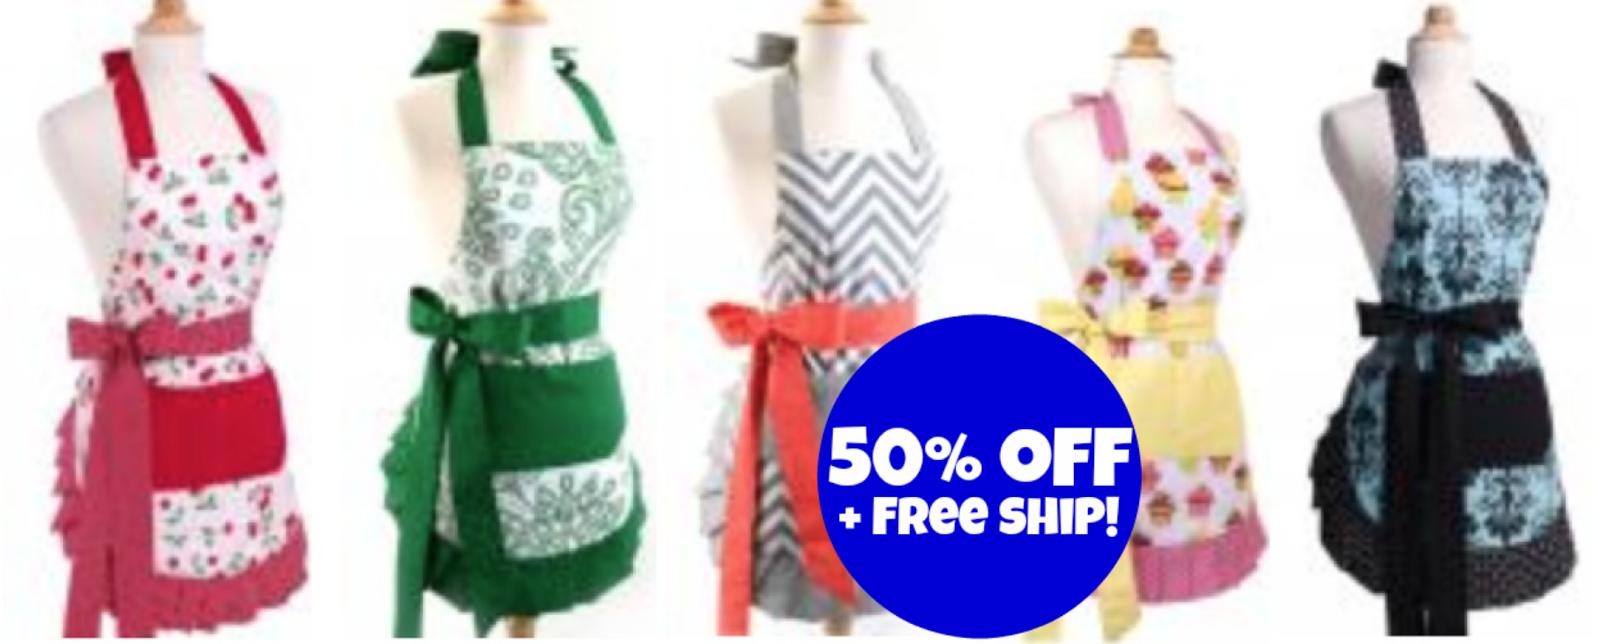 http://www.thebinderladies.com/2014/11/flirty-aprons-50-off-free-shipping.html#.VHYHz4fduyM